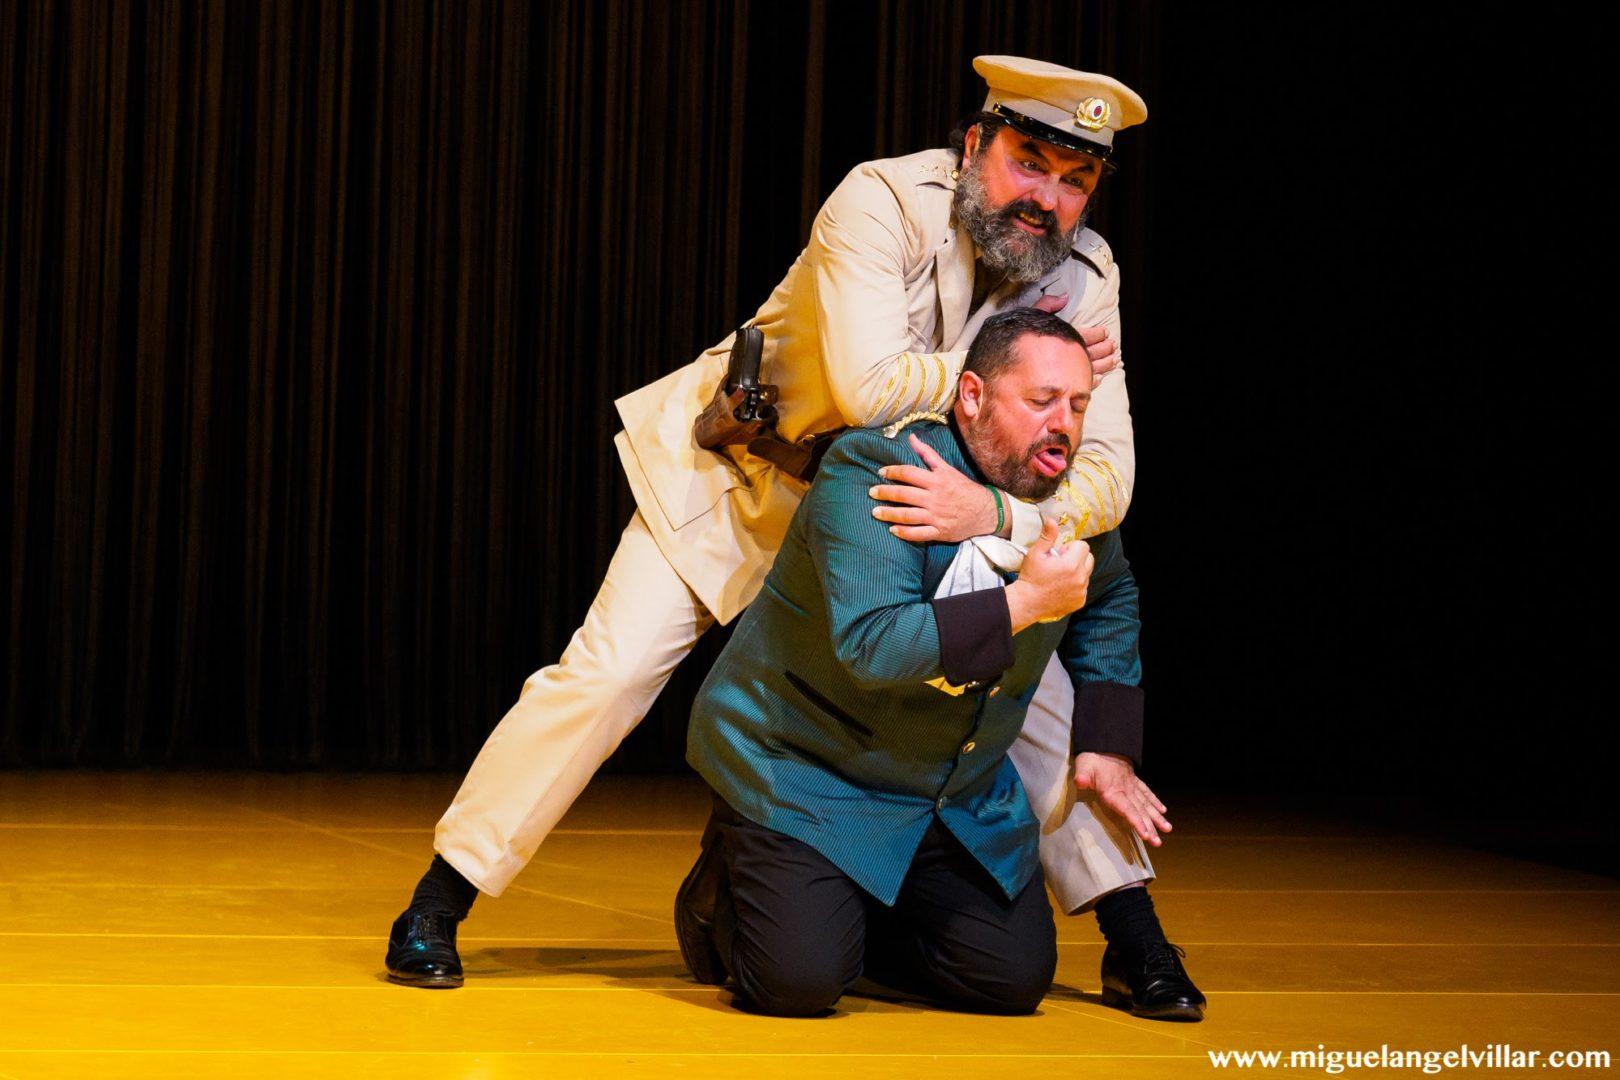 La comedia de las mentiras - Paco Tous & Pepón Nieto